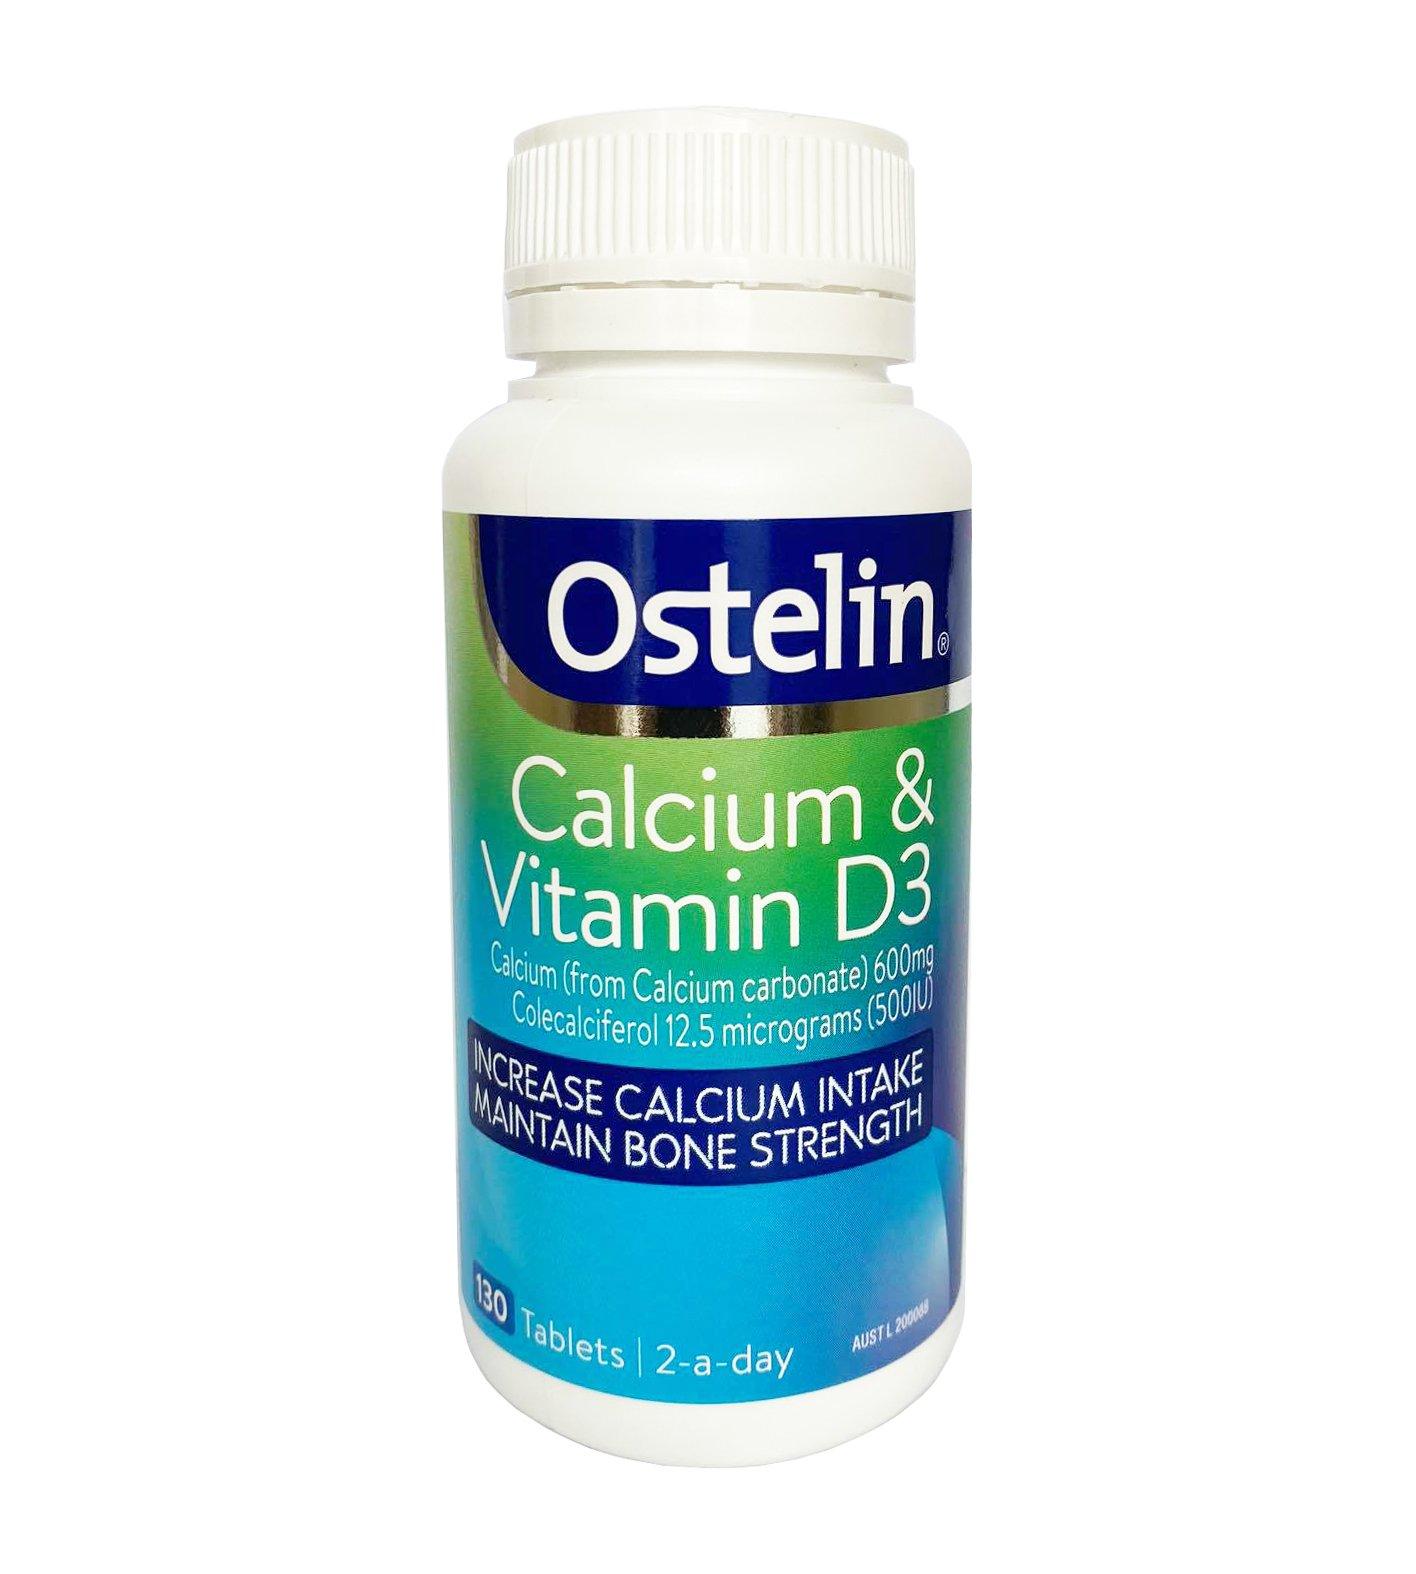 Ostelin Calcium & Vitamin D3 loại 130 viên (Mẫu mới)